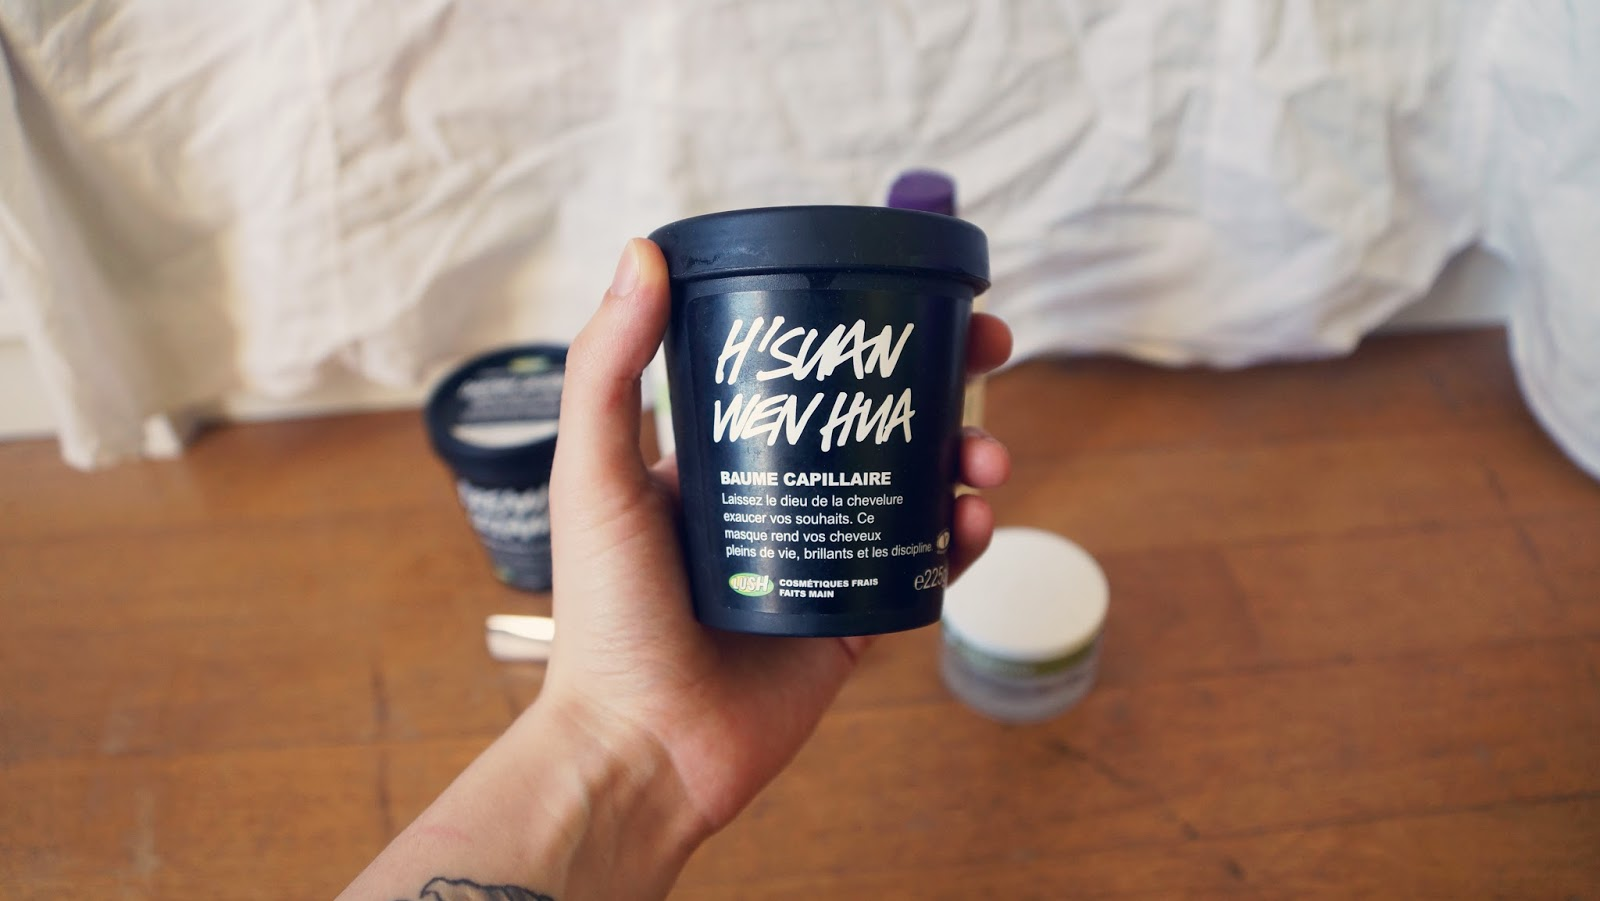 H'Suan Wen Hua Lush Hair Mask Review